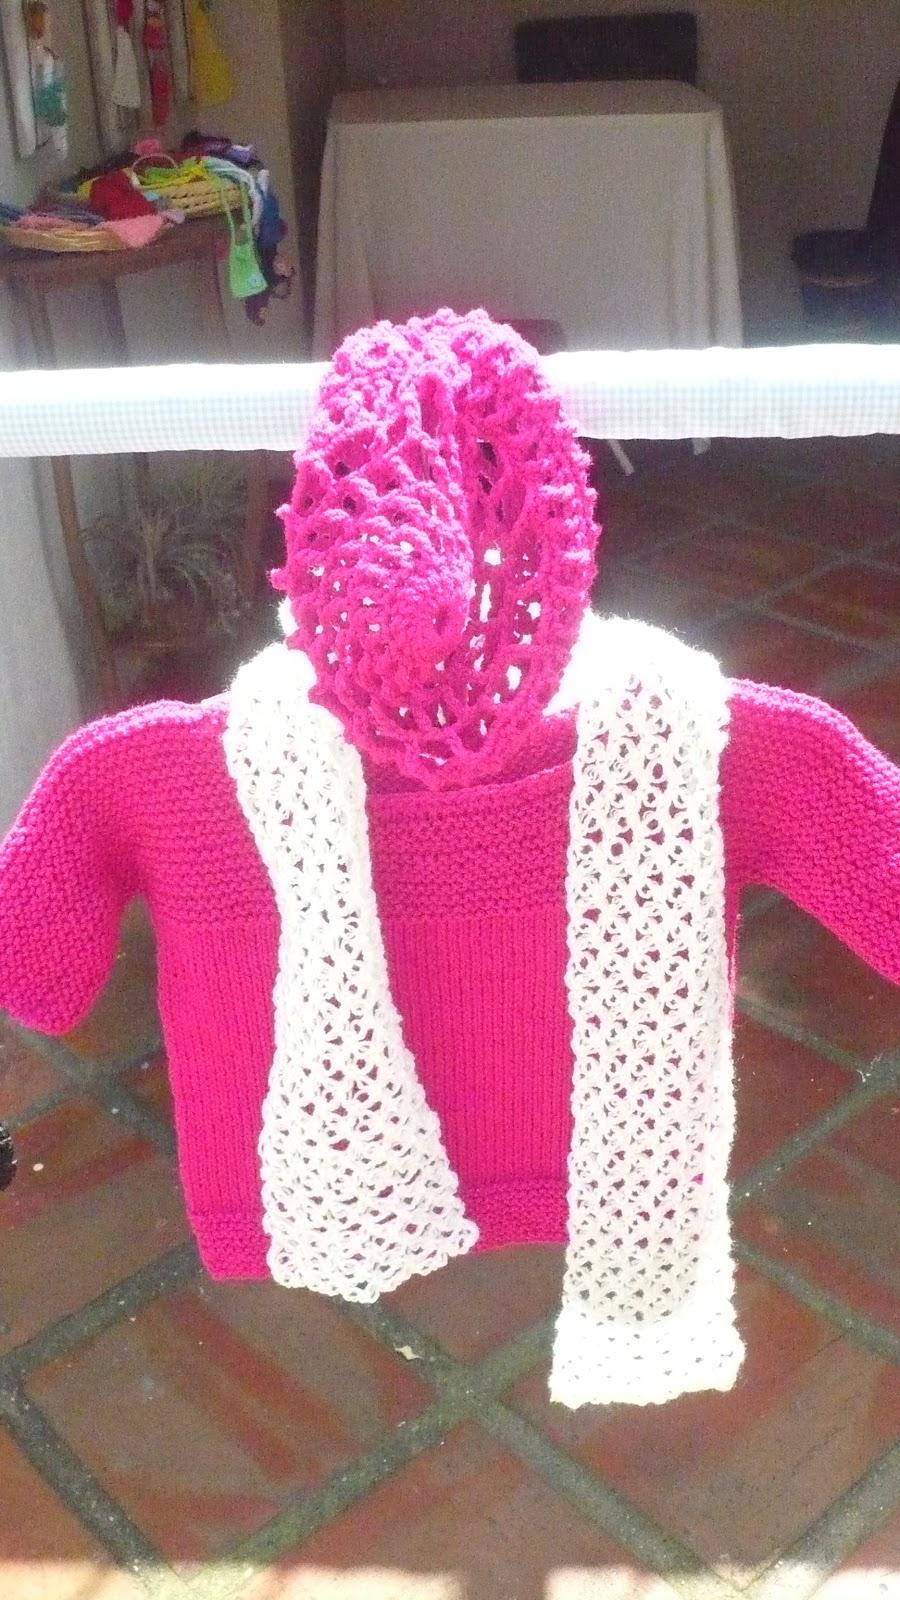 Dtejidodetalles: Blusa para niña tejida en dos agujas